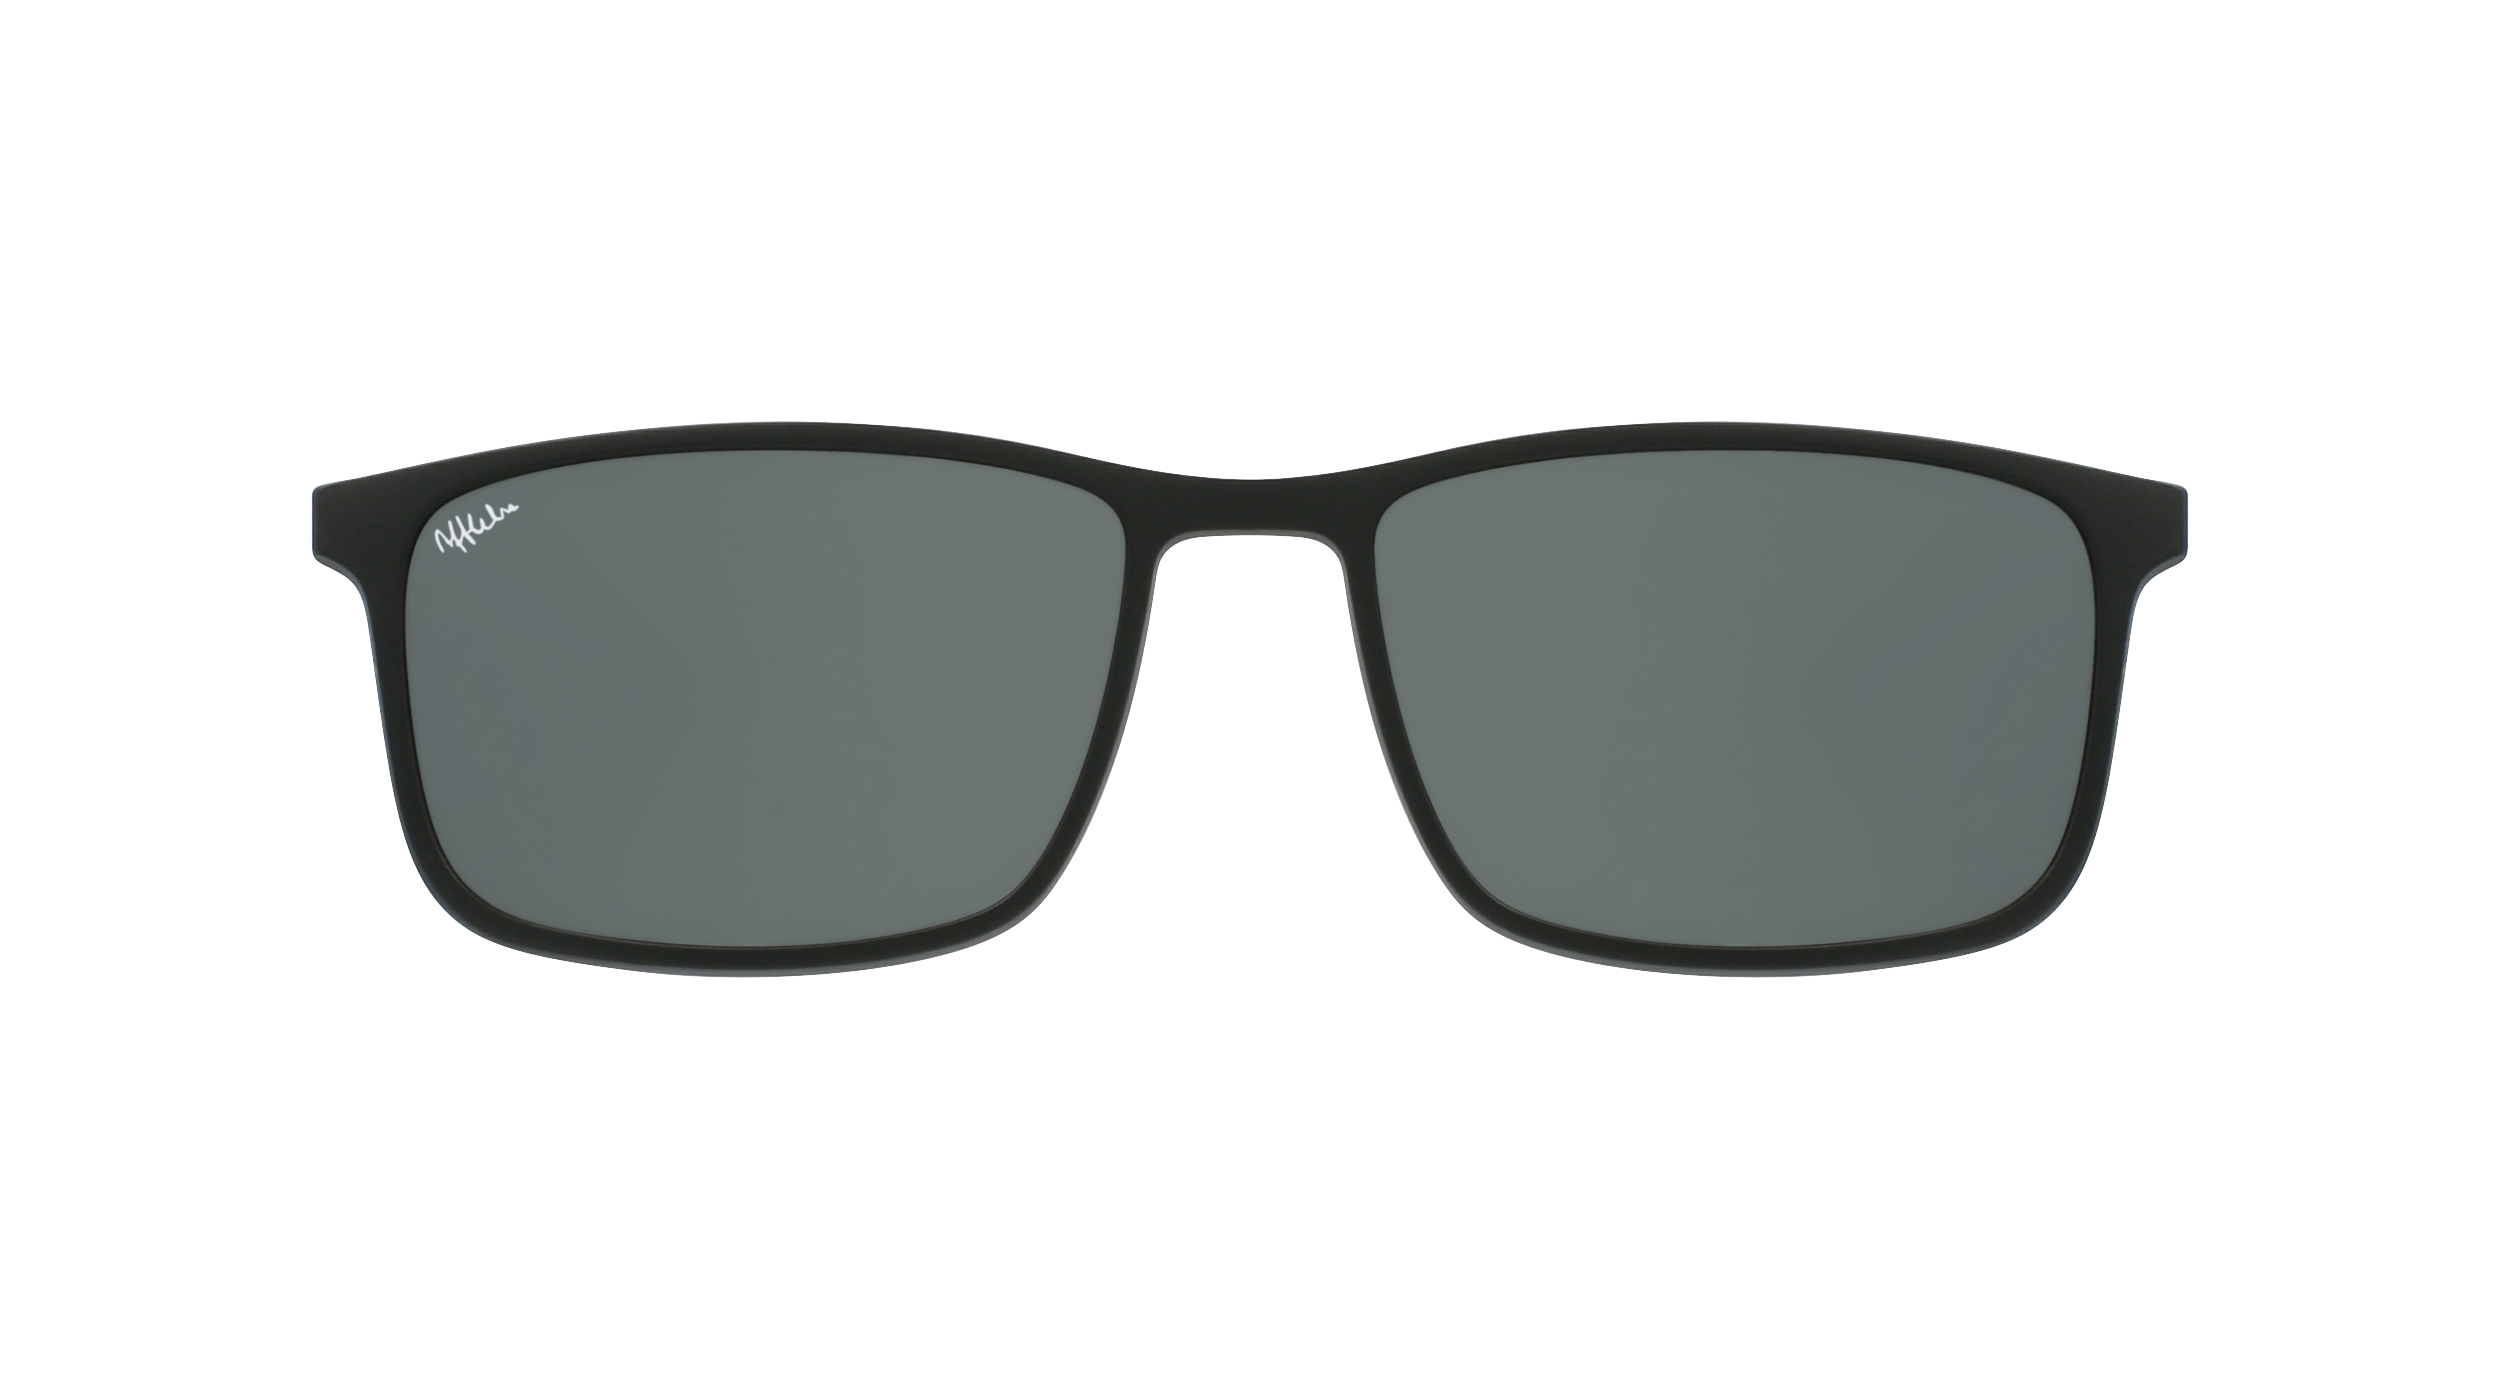 afflelou/france/products/smart_clip/clips_glasses/07630036458662.png